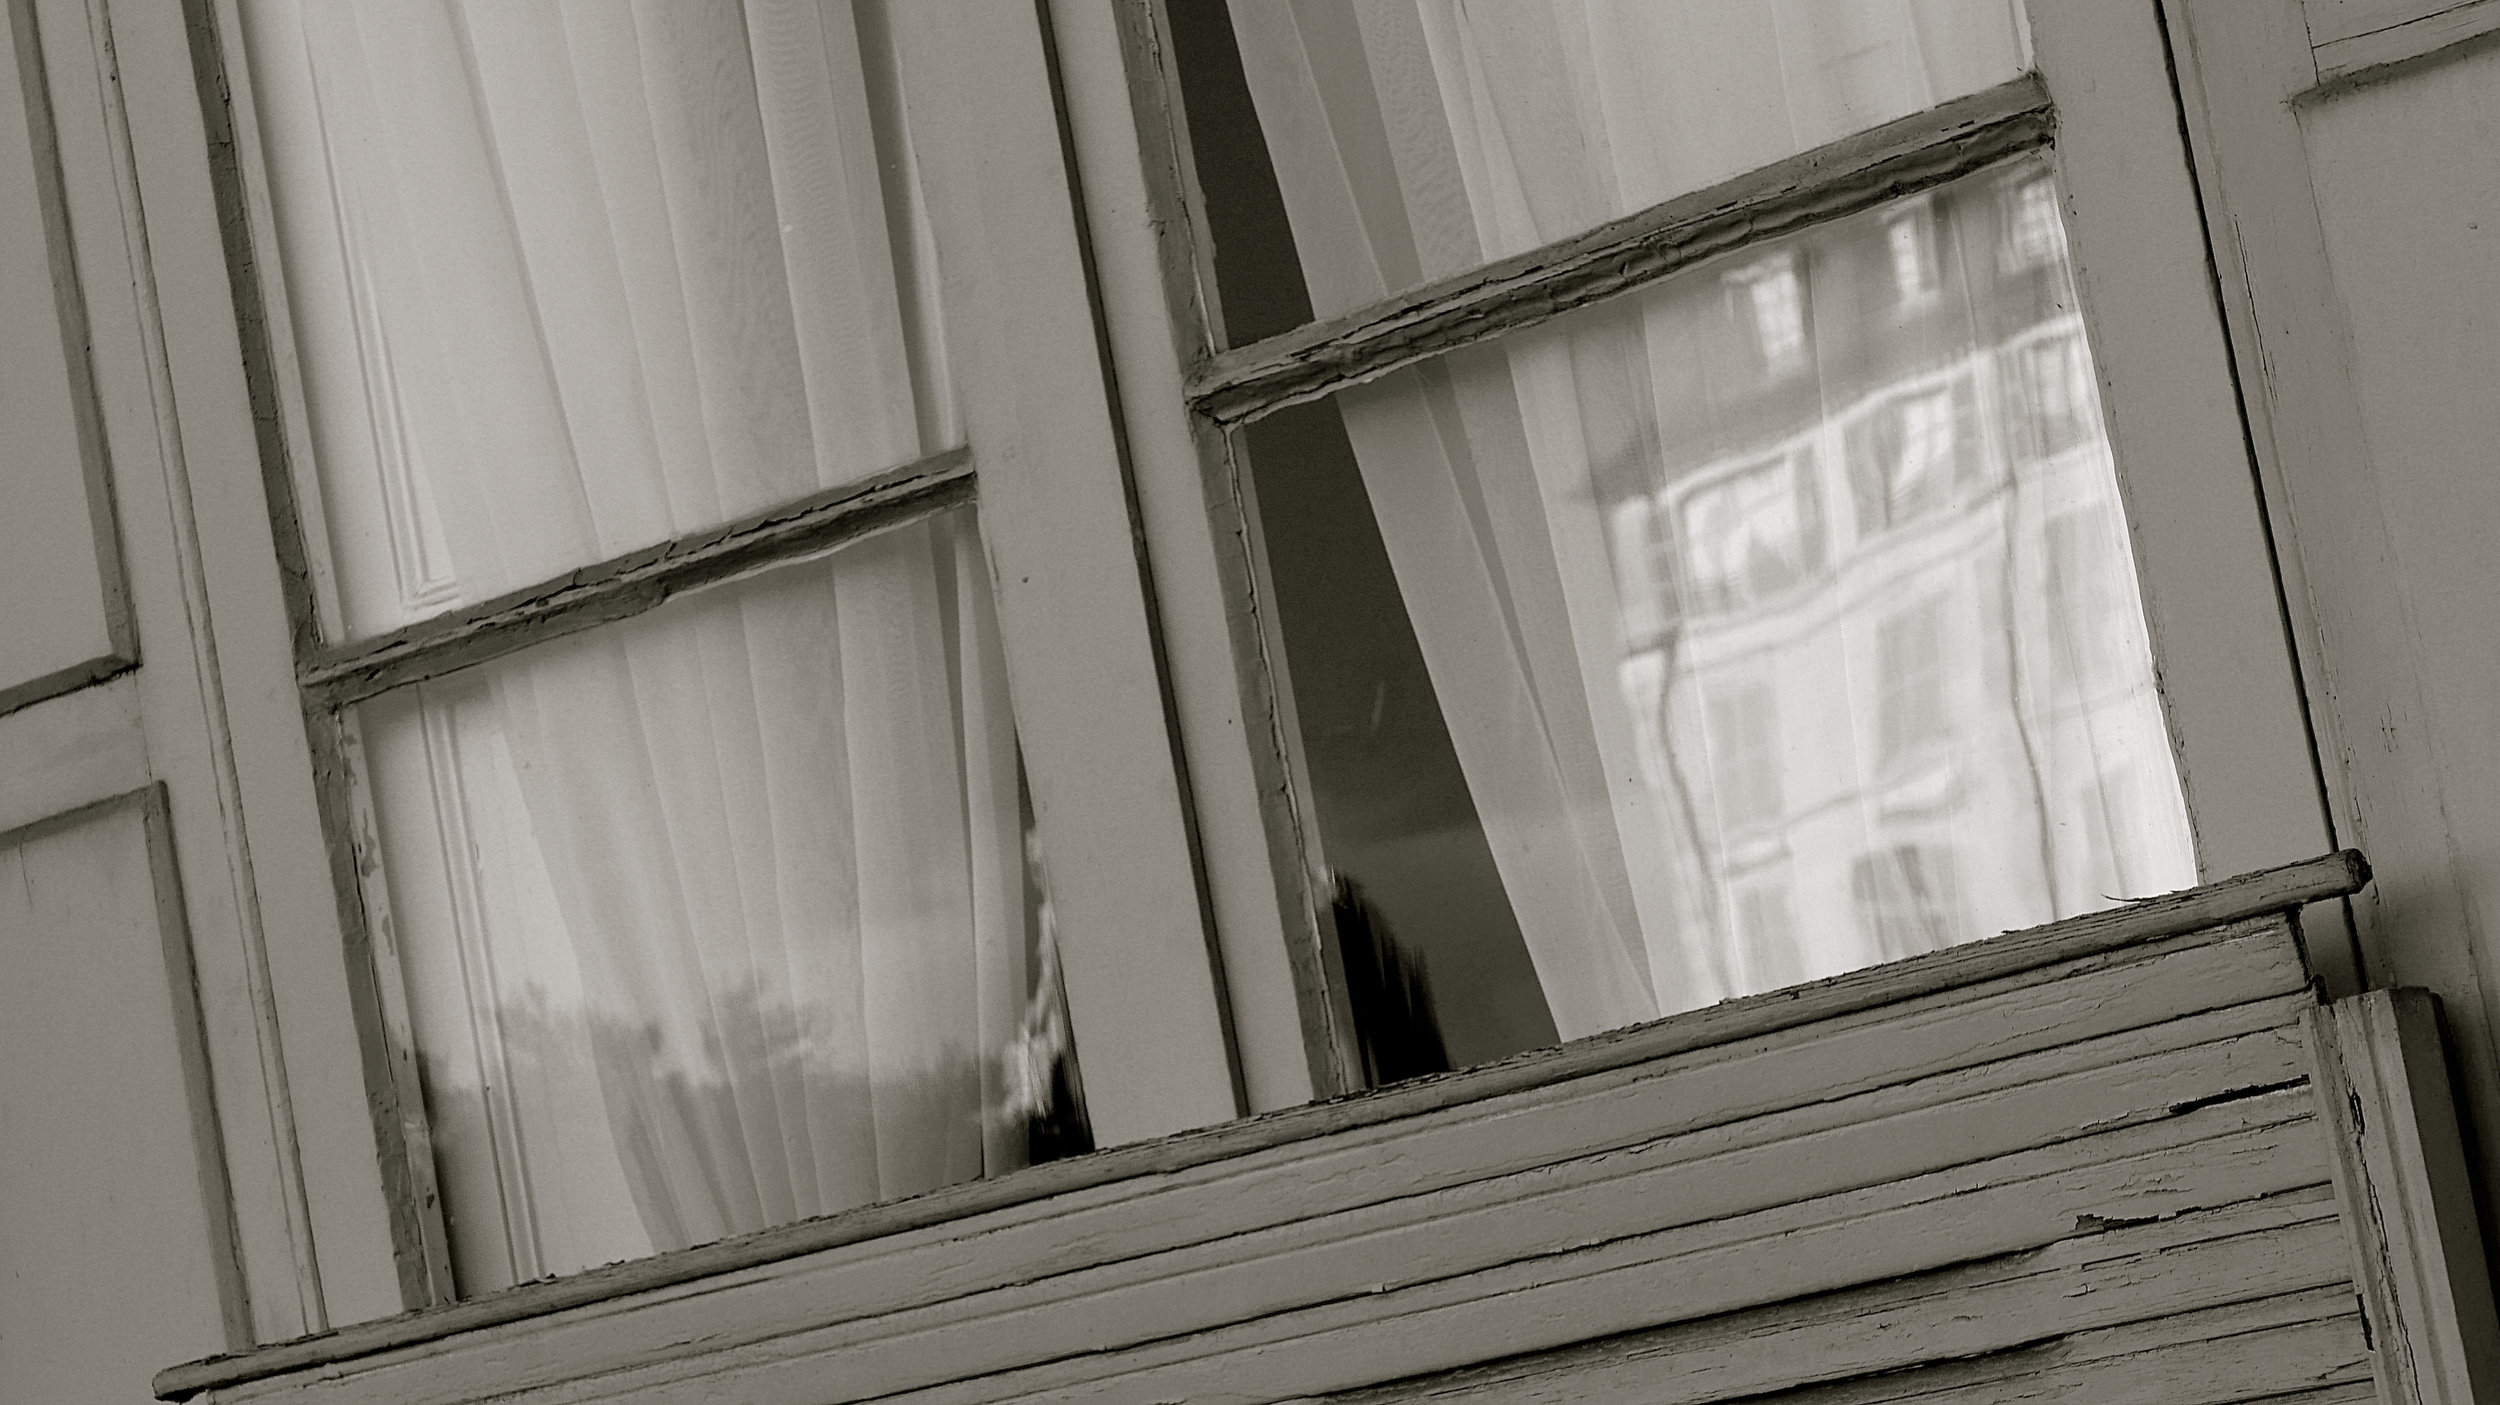 Pau. La Justicia reflejada ventana